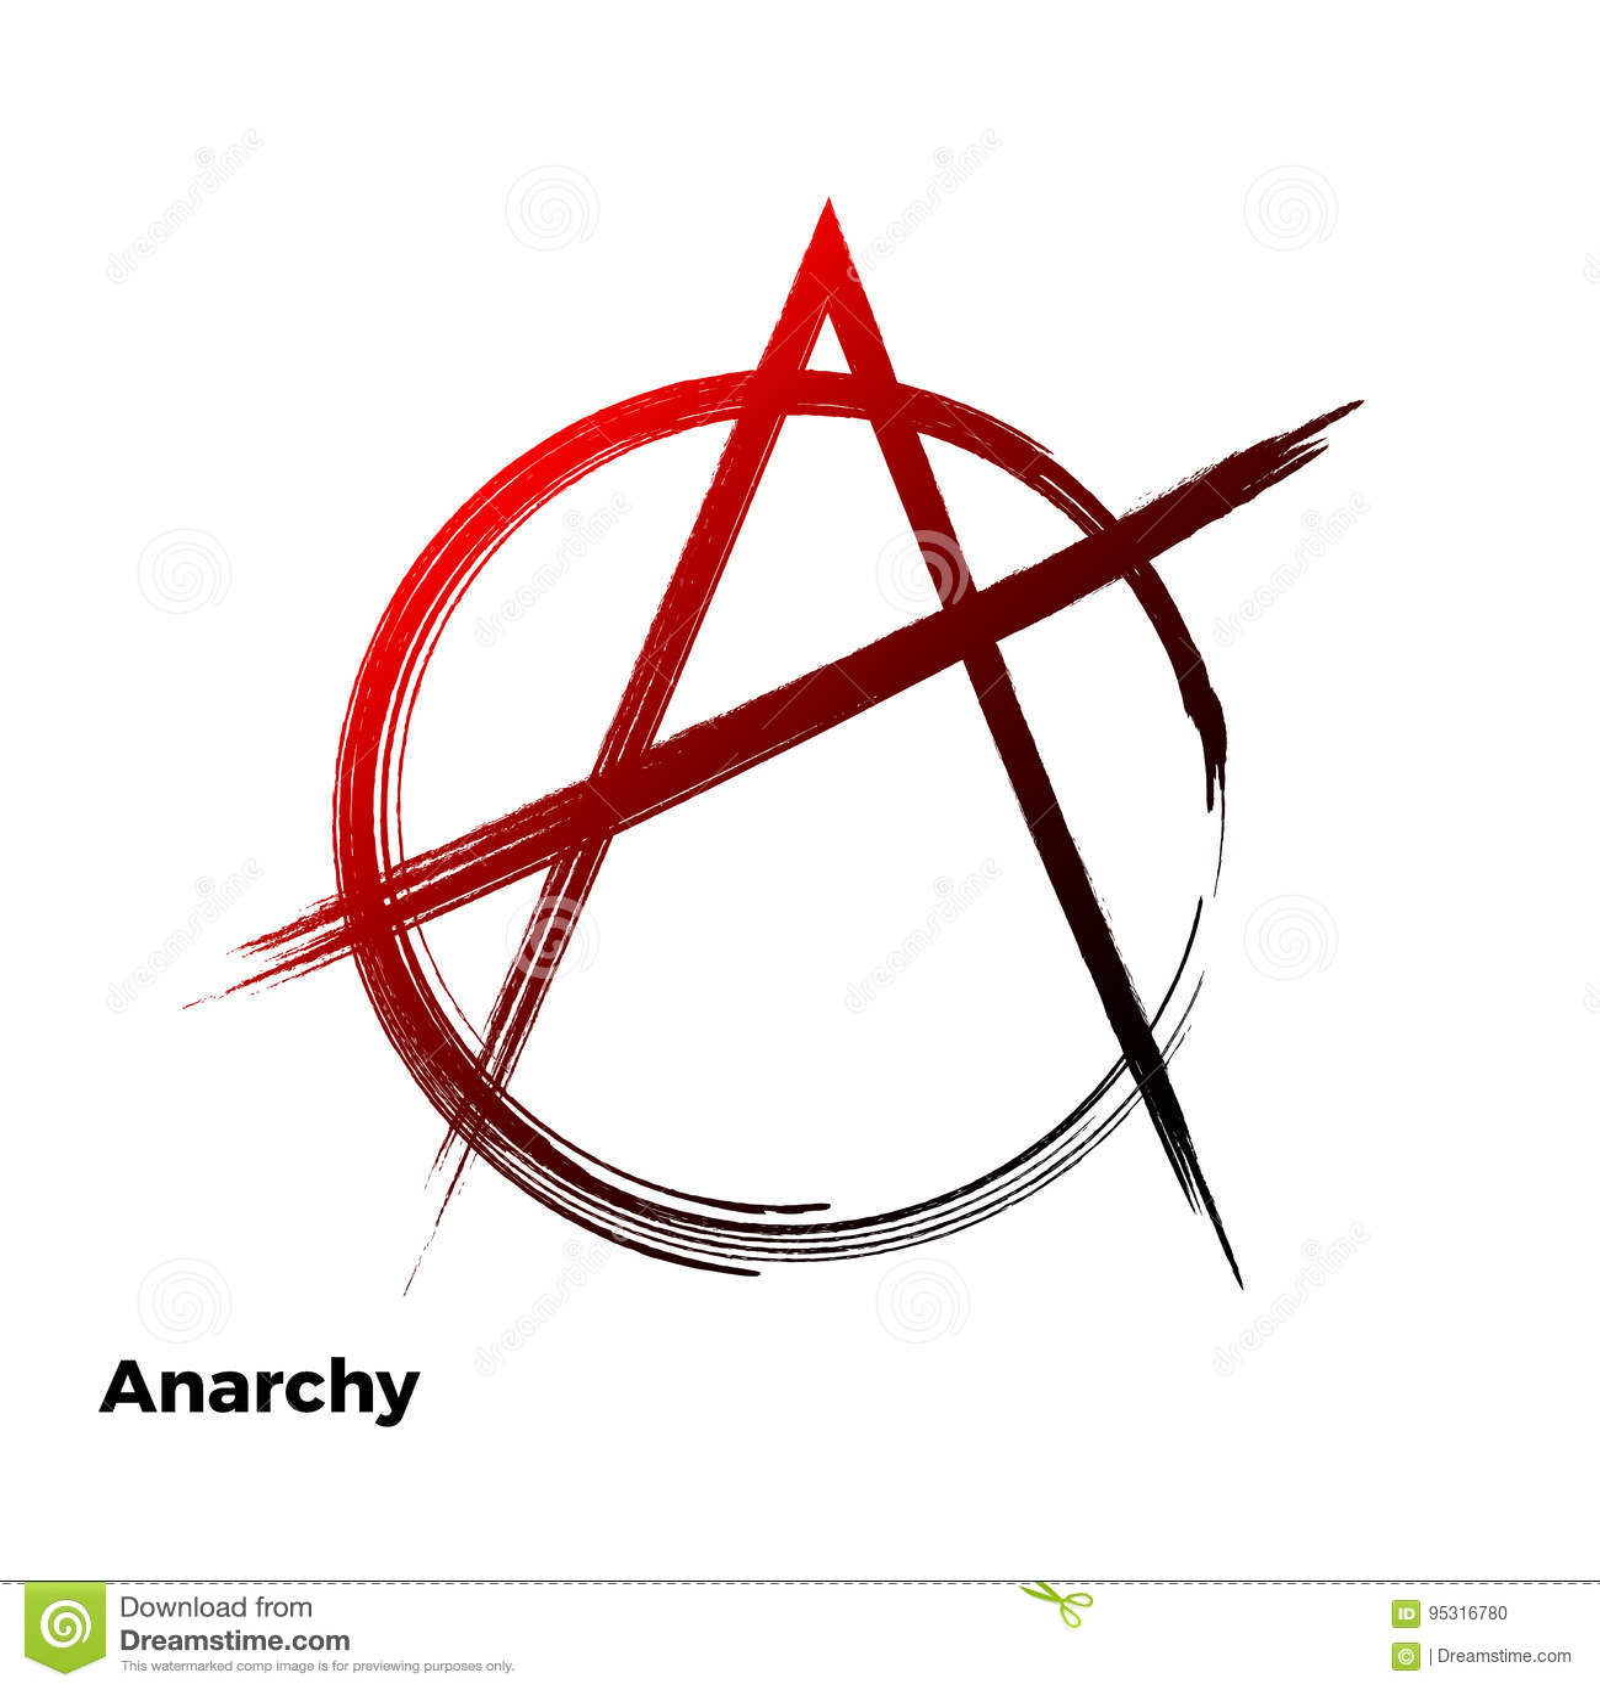 Anarchy symbol stock images 460 photos buycottarizona